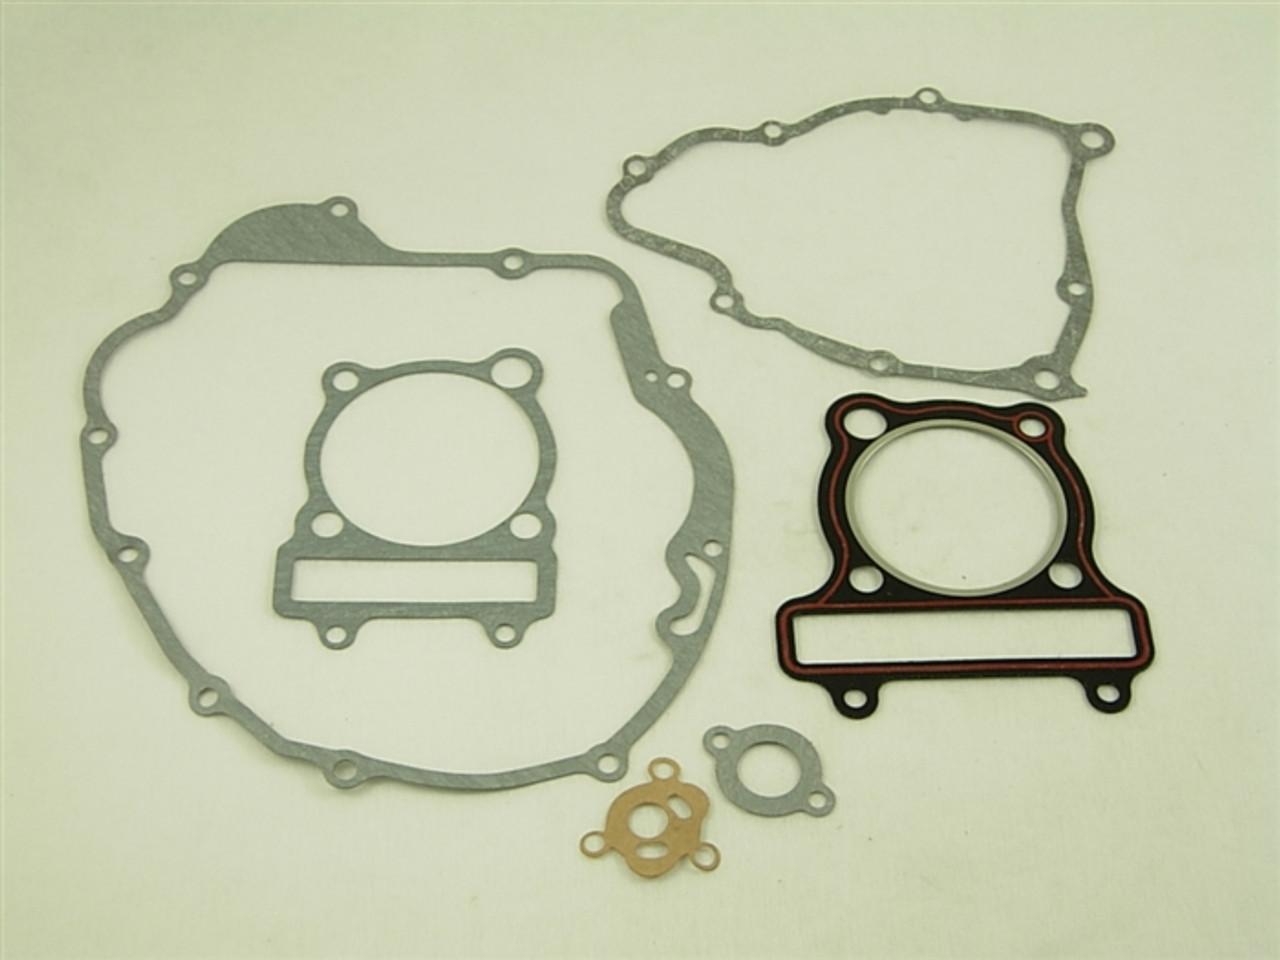 ENGINE GASKET SET 11855-A104-1